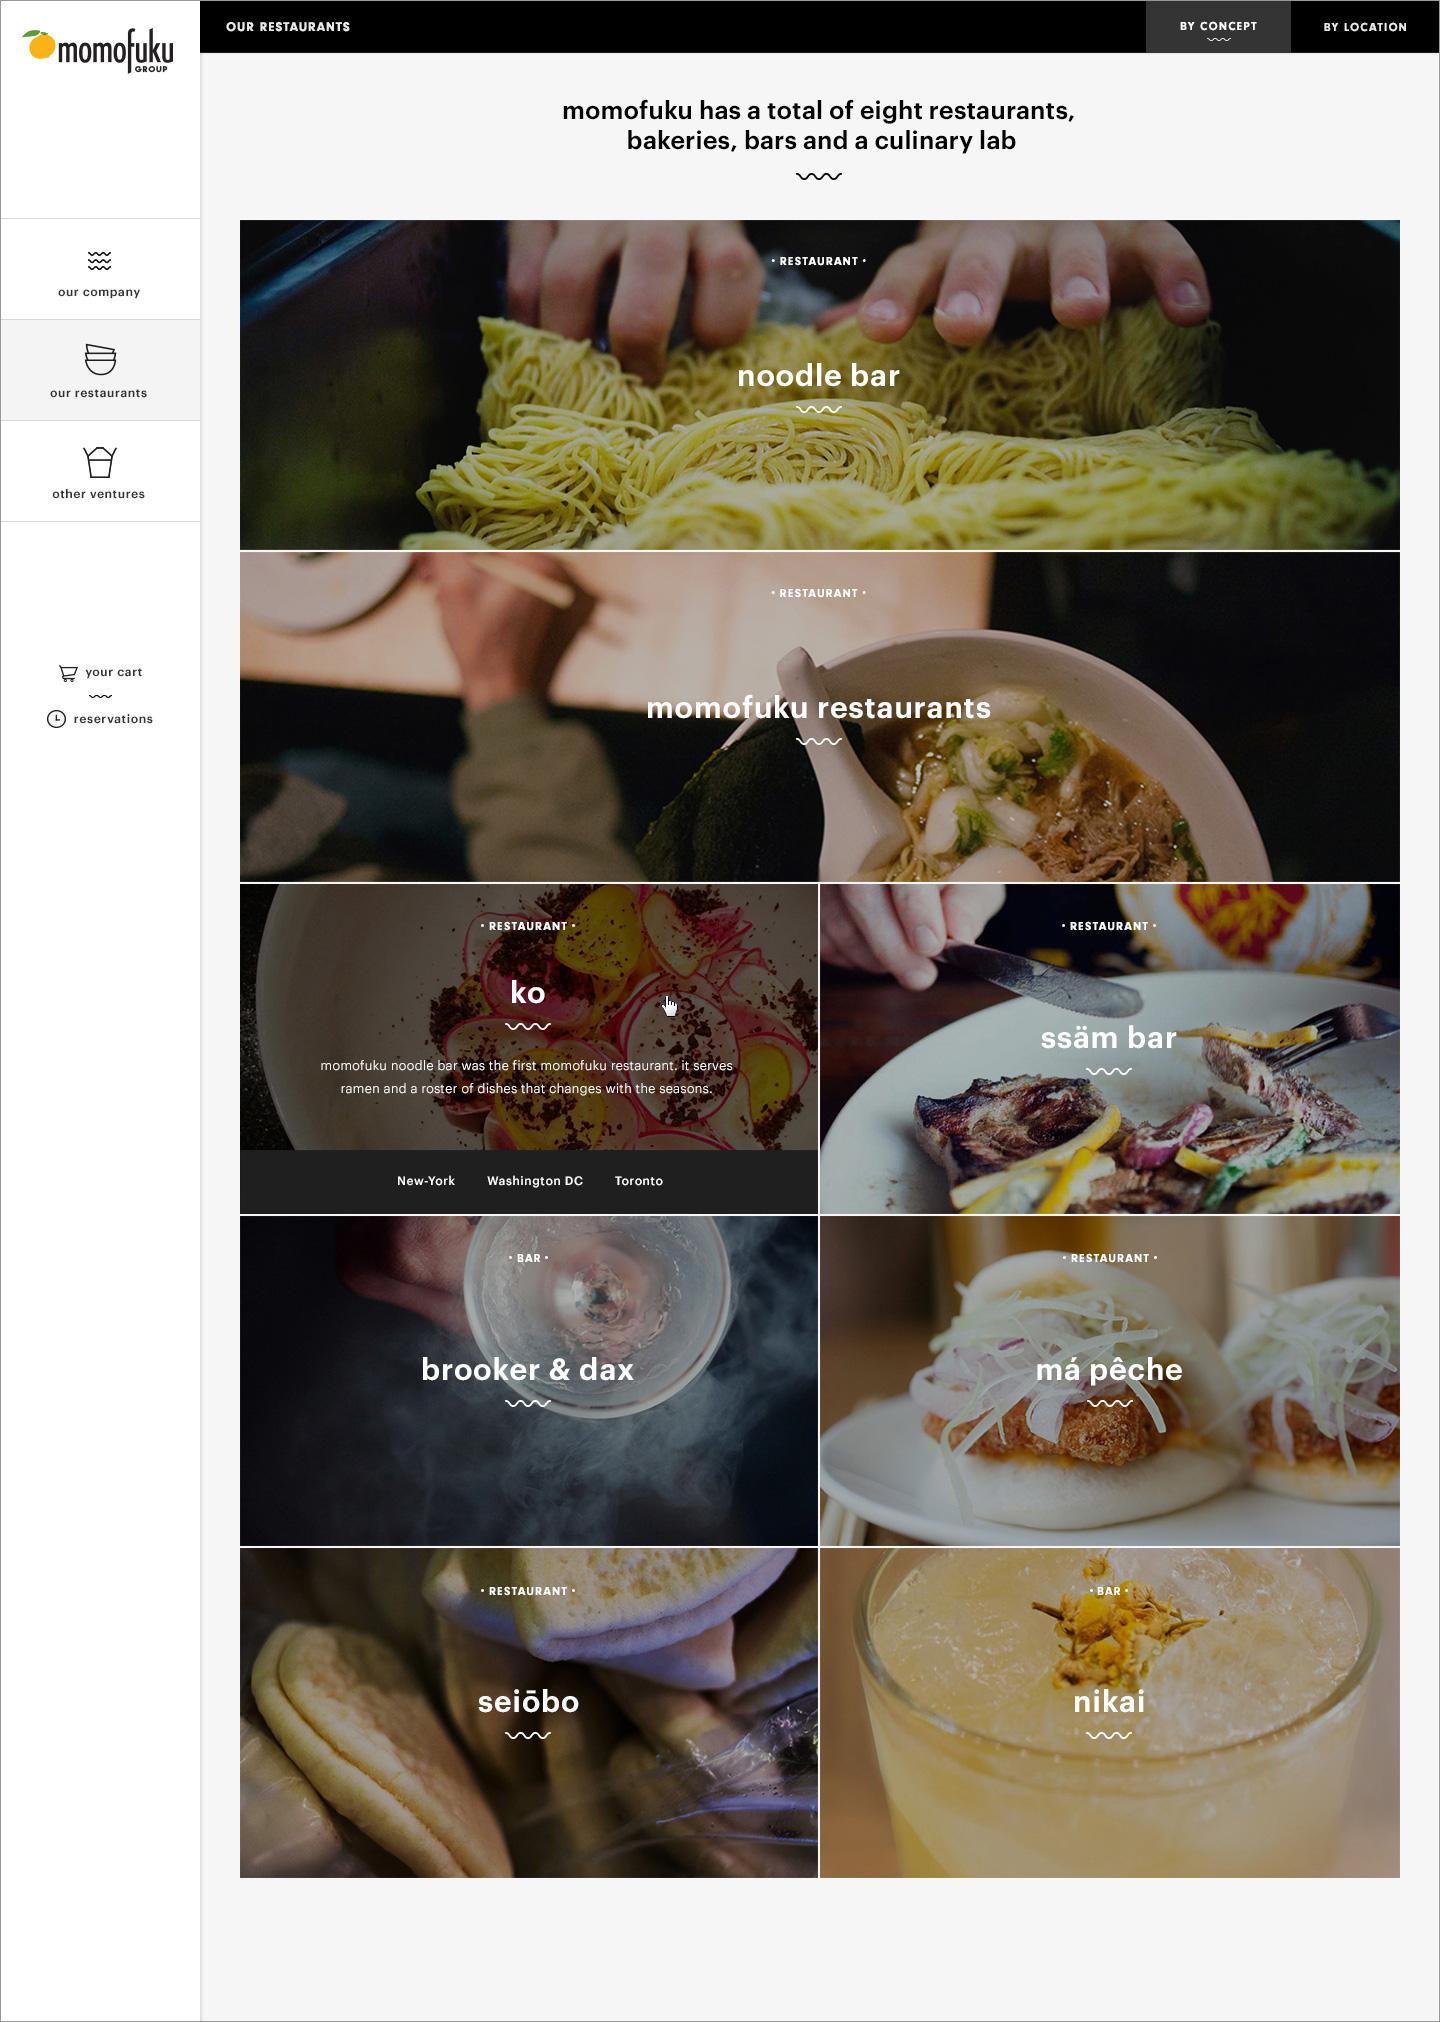 Momofuku_restaurant_ByConcept.jpg